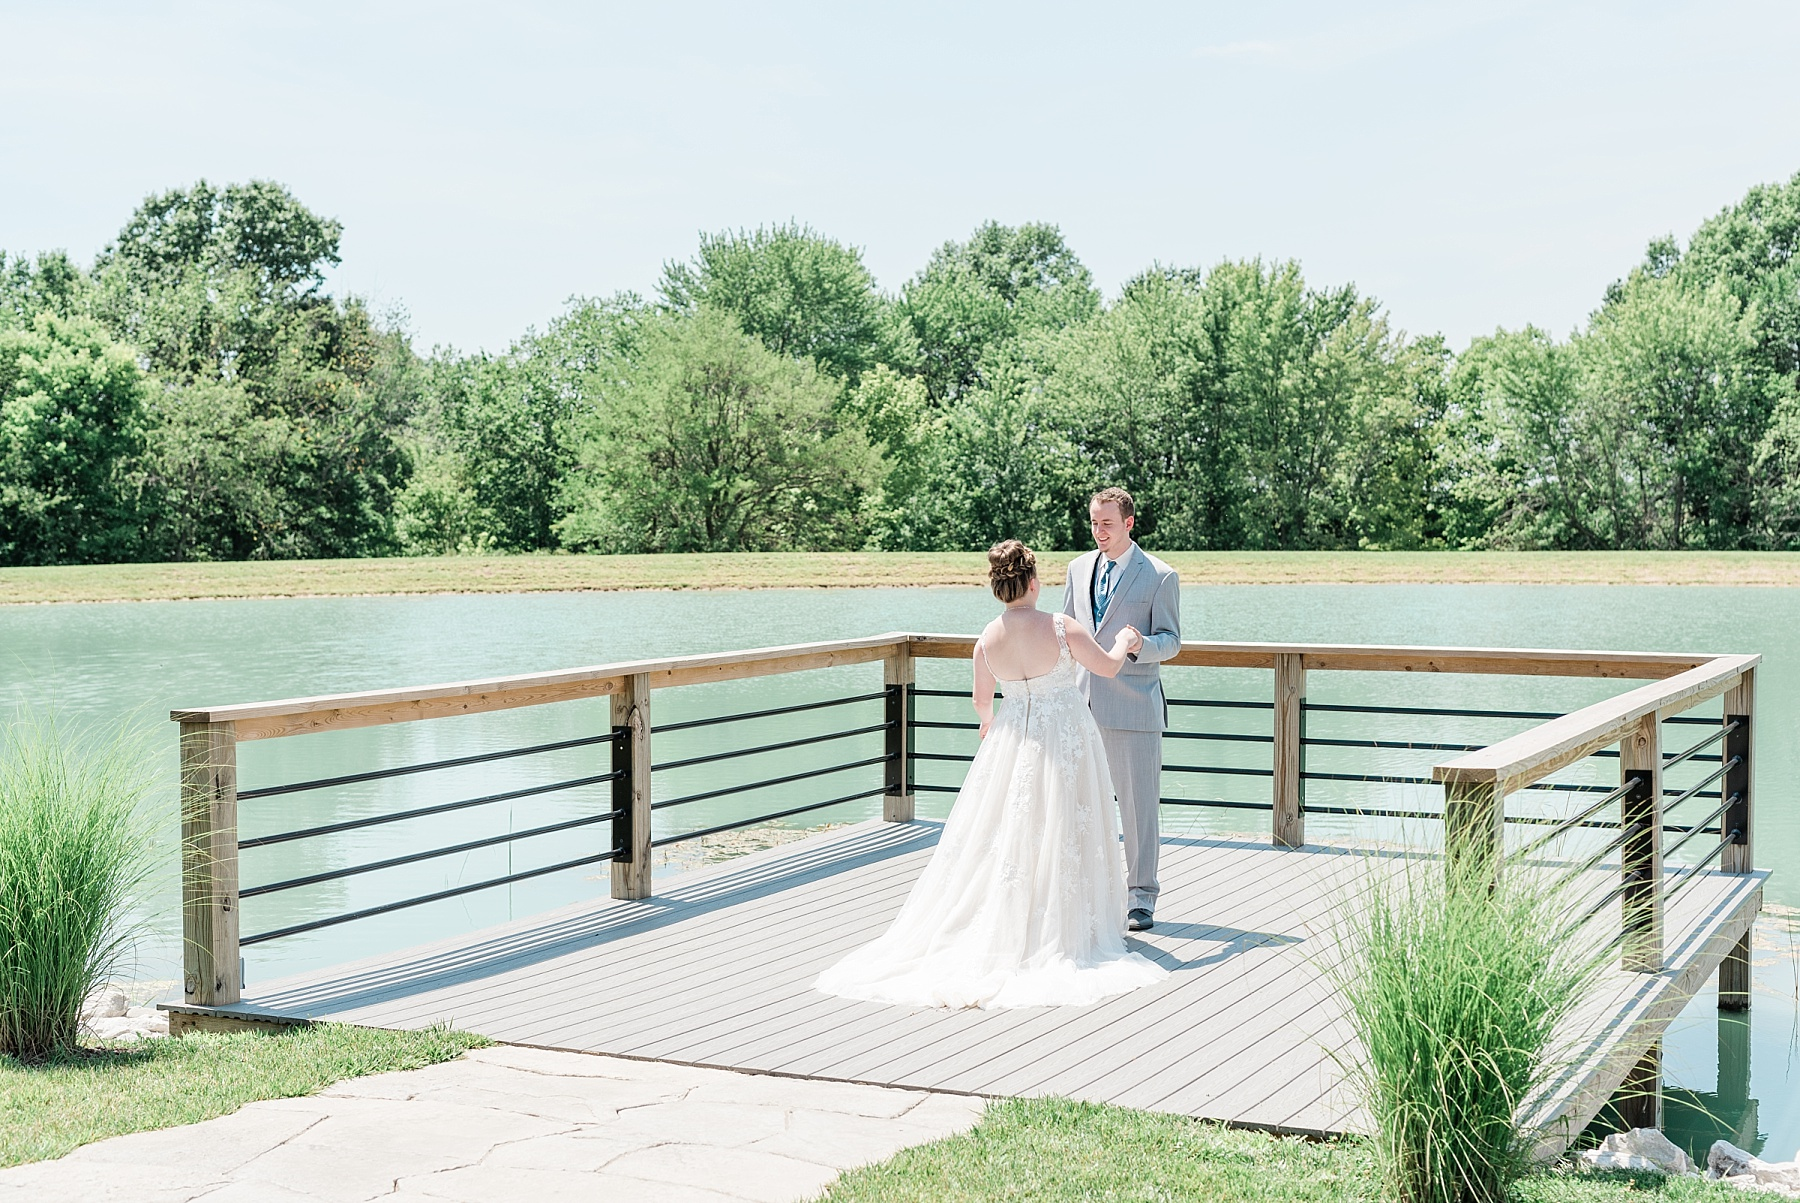 Intimate Summer Wedding at Emerson Fields by Kelsi Kliethermes Photography Best Missouri and Maui Wedding Photographer_0026.jpg